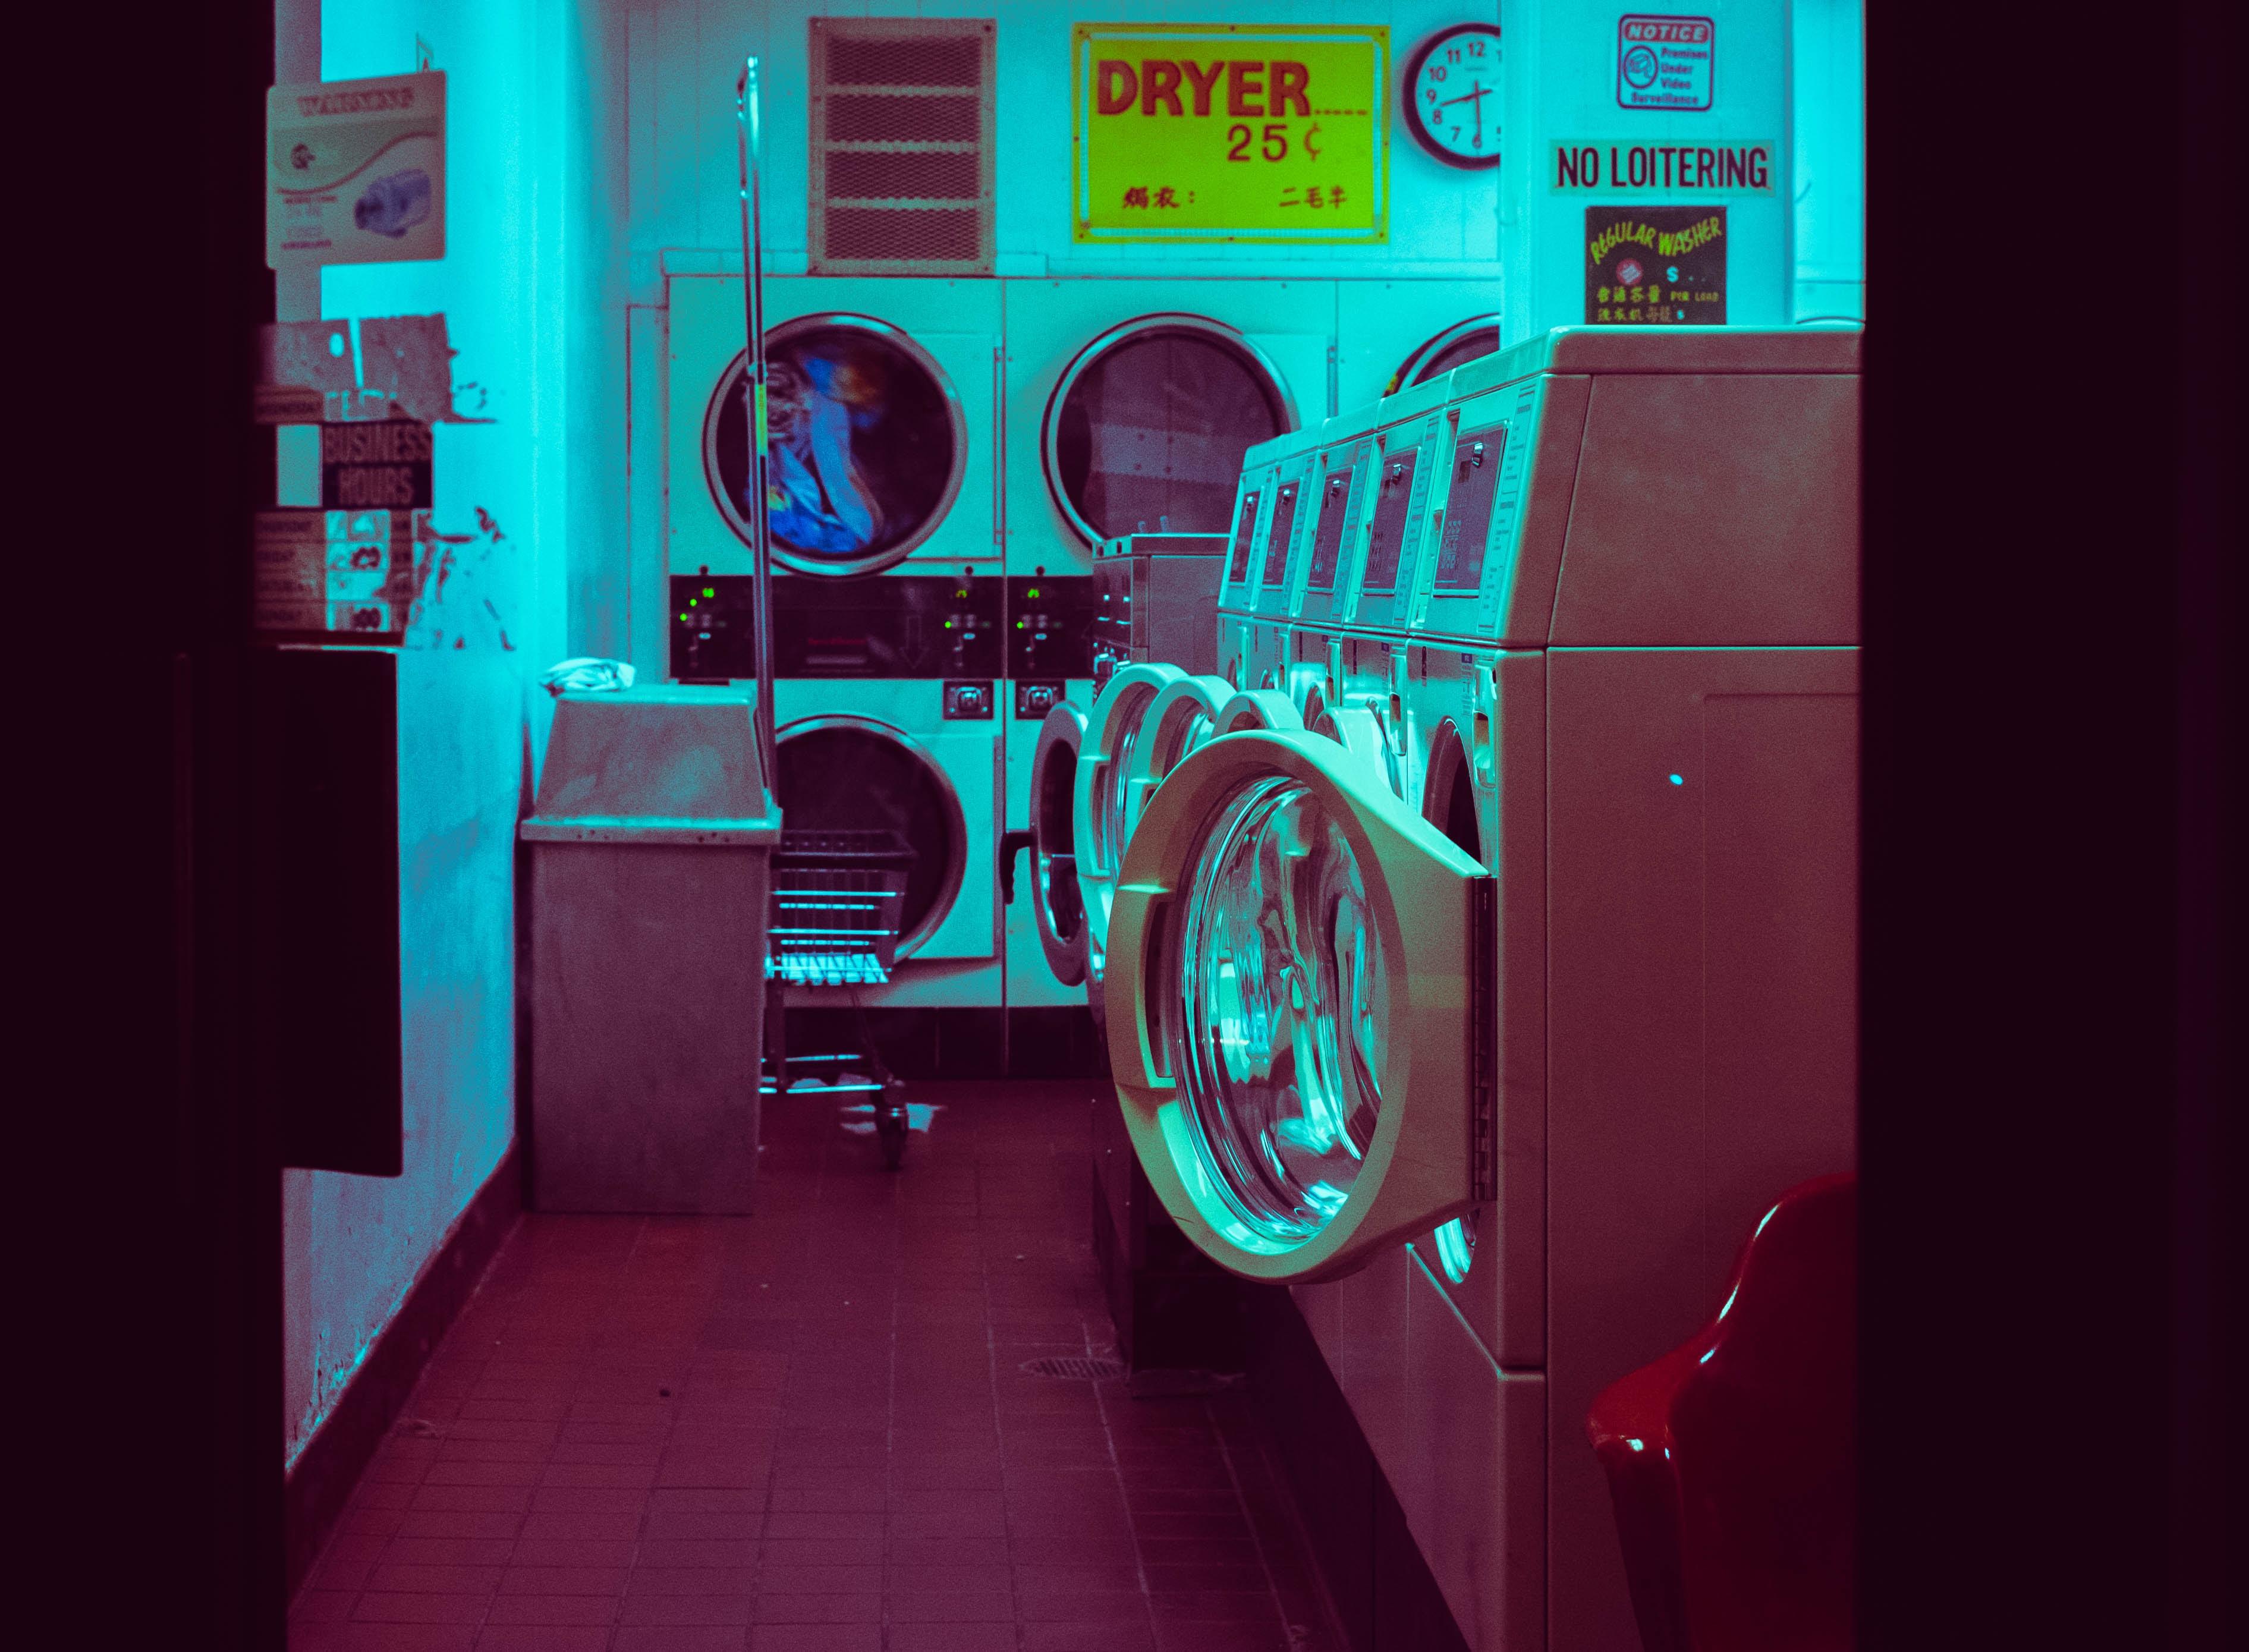 white open laundry machines